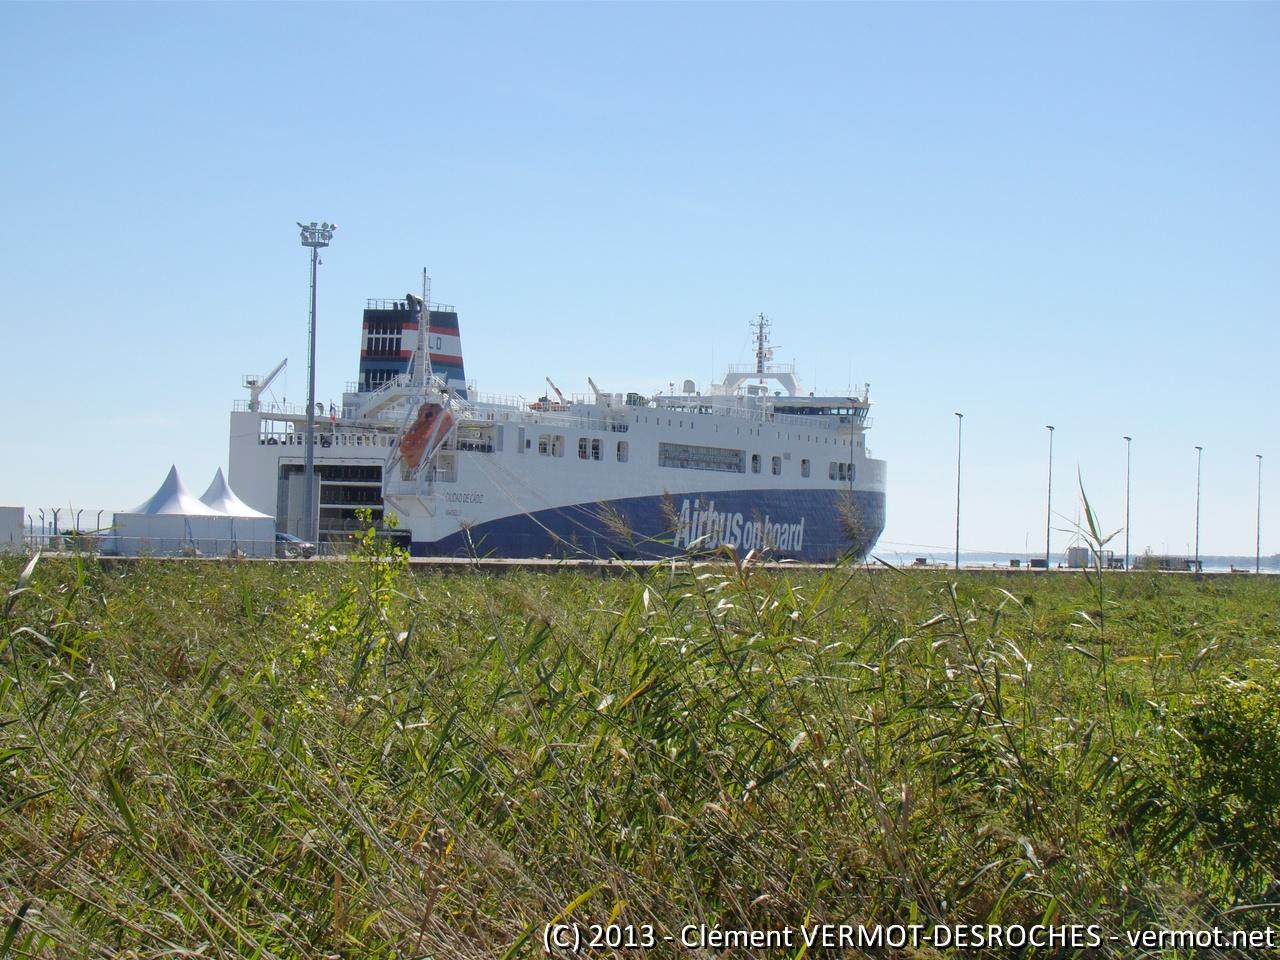 Ciudad de Cadiz - Le navire roulier vu d'un peu plus loin